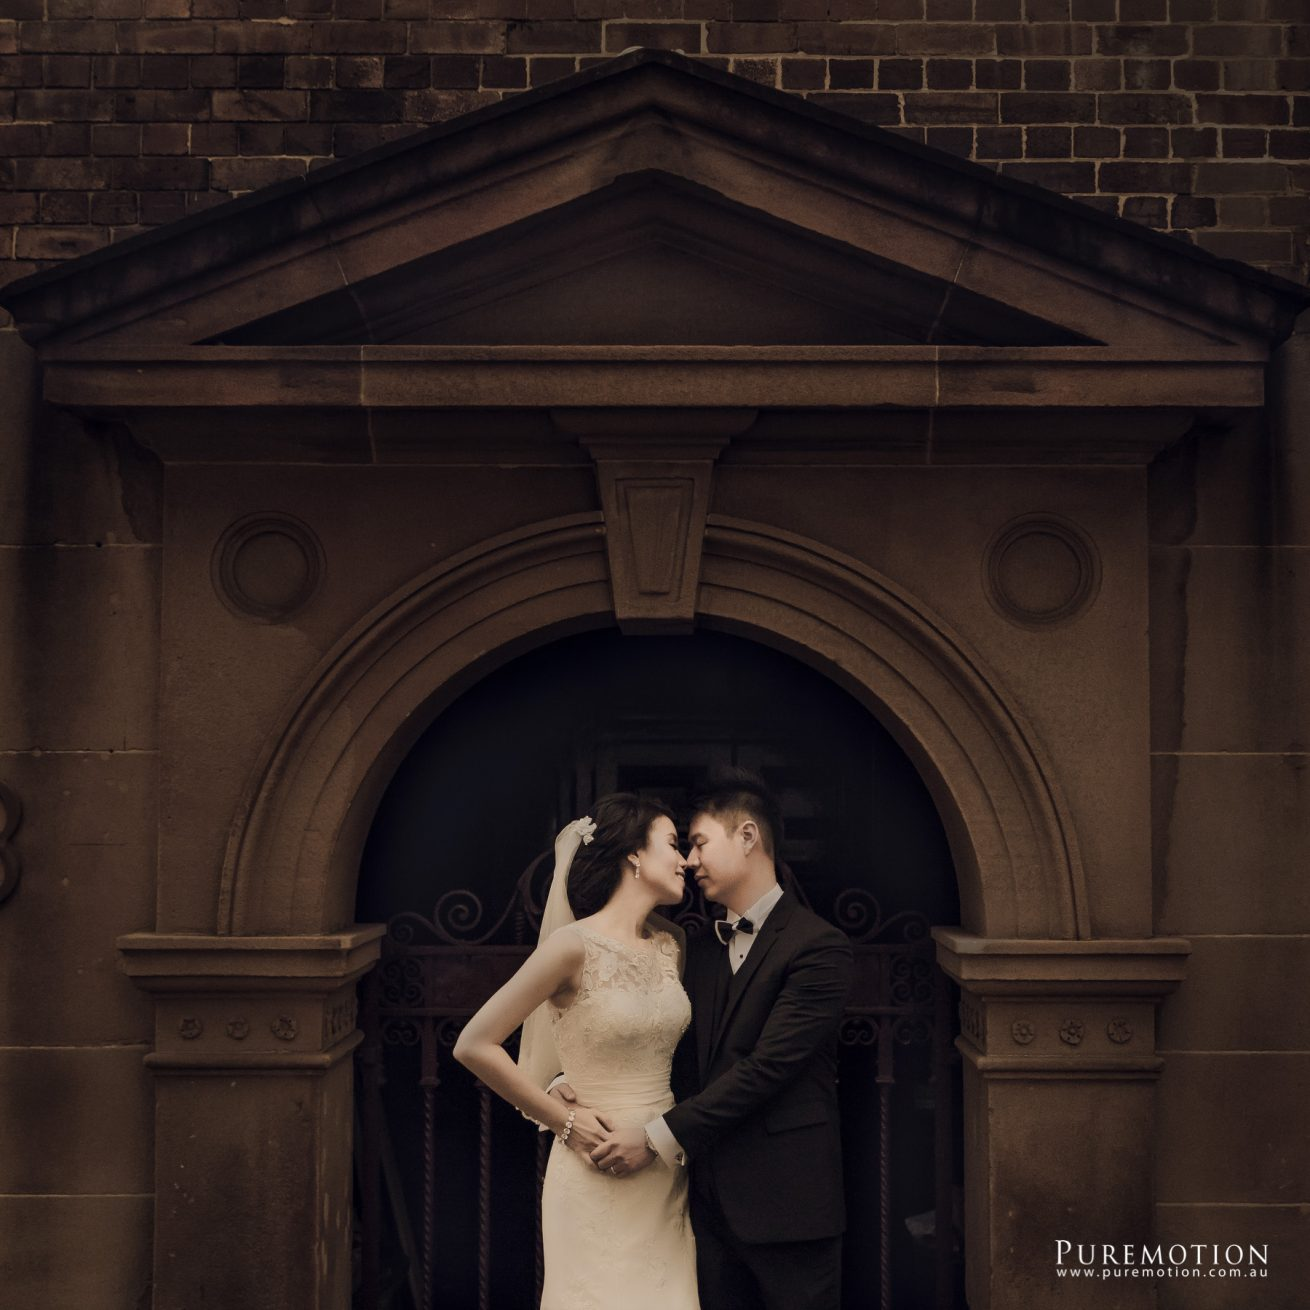 140315 Puremotion Wedding Photography Sydney Darling Harbour Dockside CoraBobby-0081